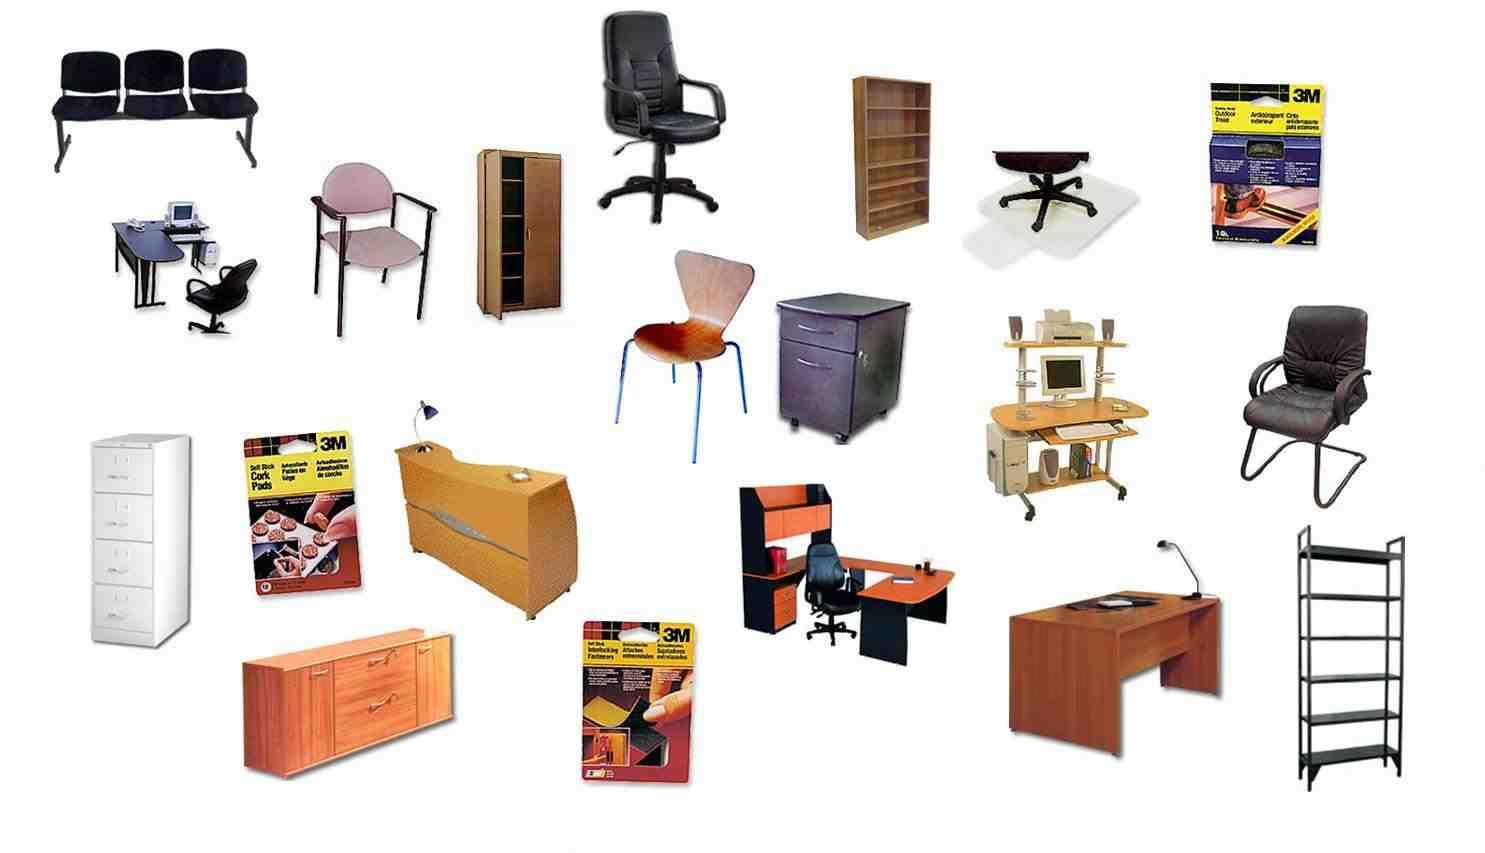 Patrimonio ugel sur for Lista de mobiliario para oficina